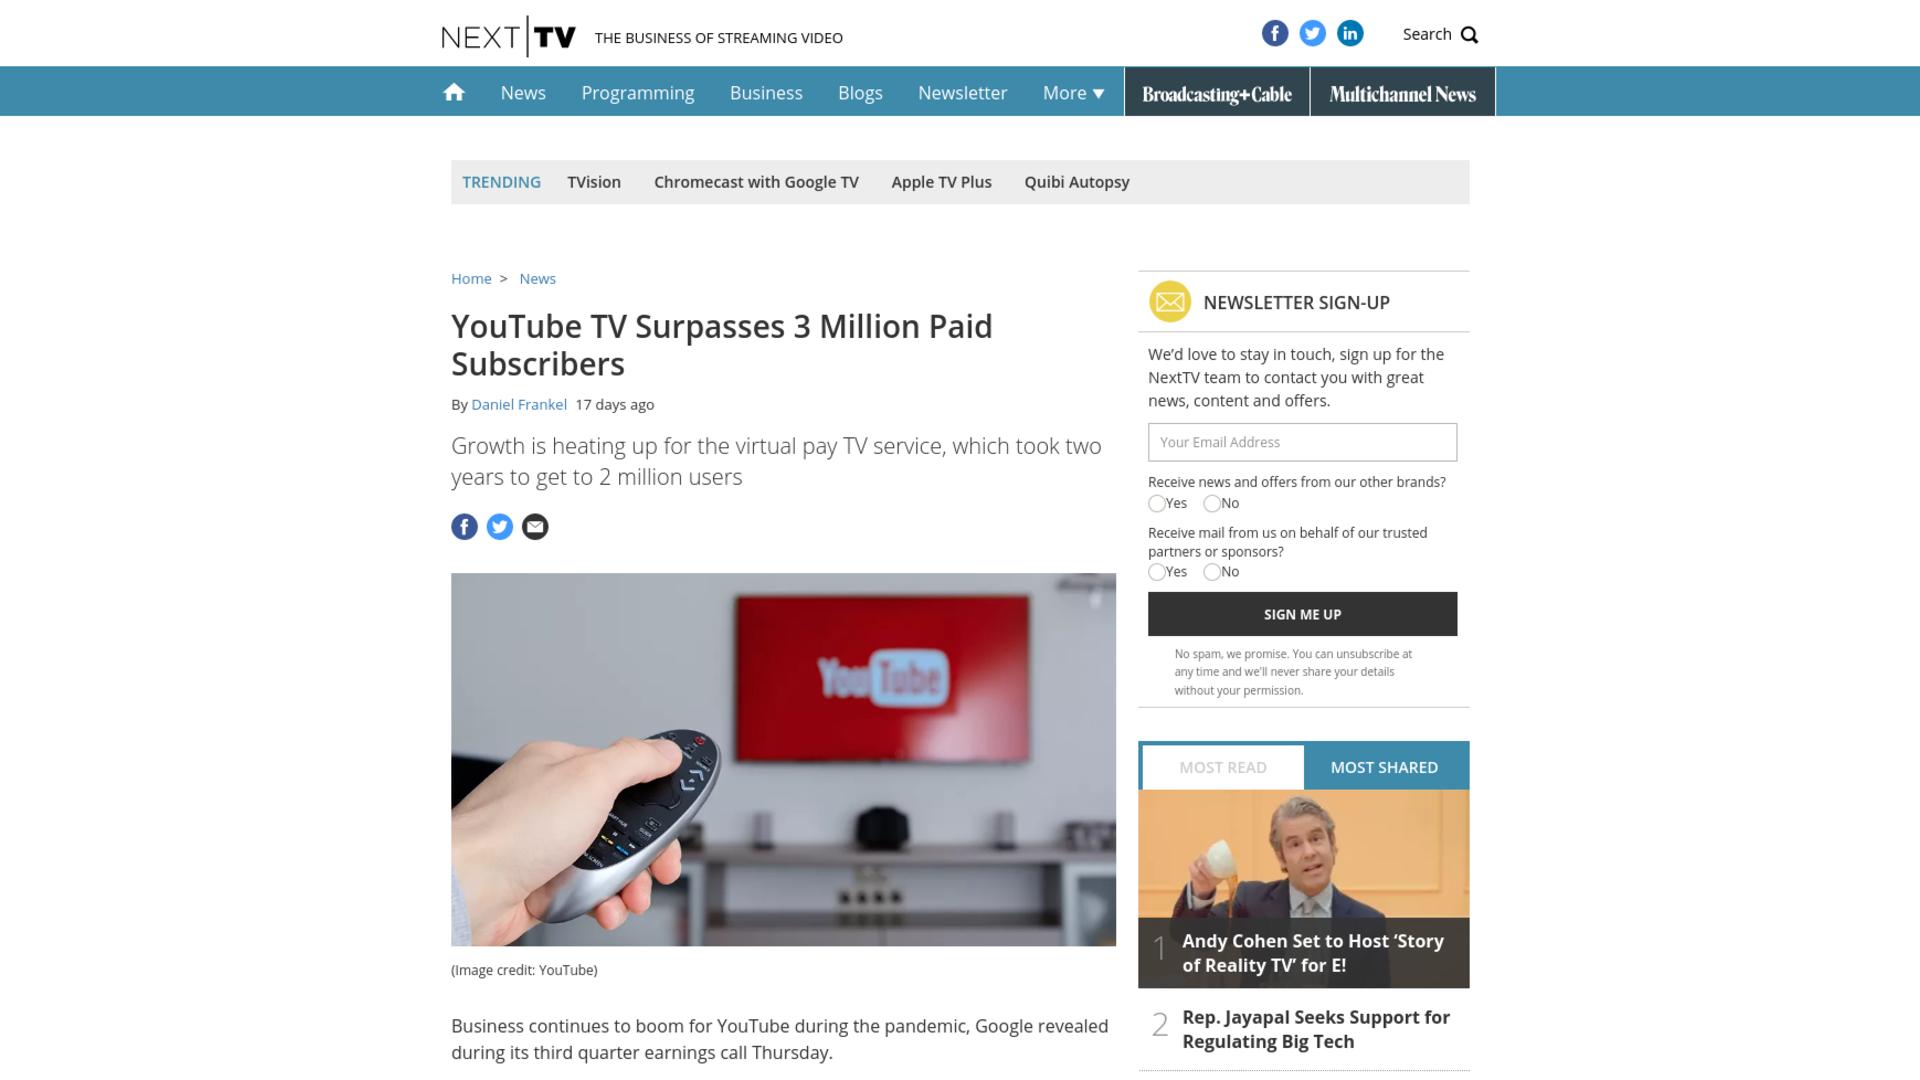 Fairness Rocks News YouTube TV Surpasses 3 Million Paid Subscribers